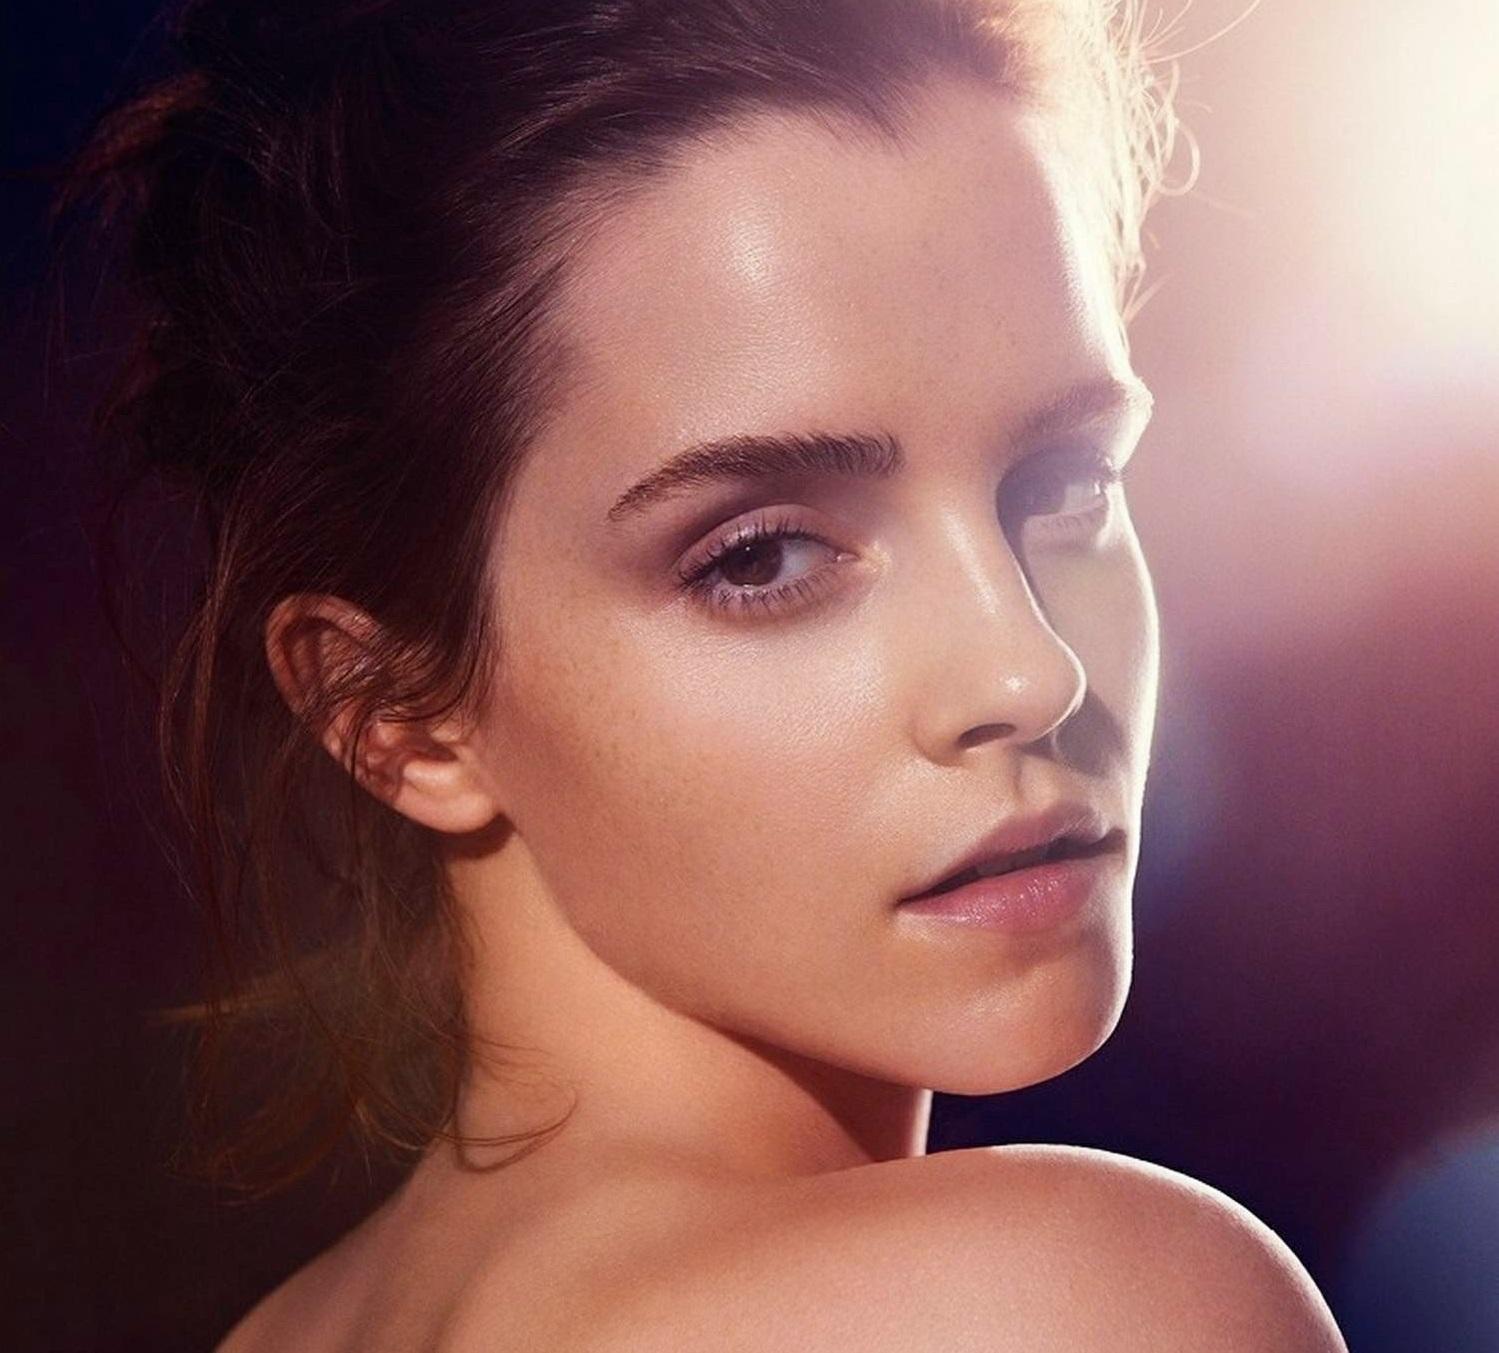 iCloud Nude Celebrity Picture Leaks: Website Warns Emma